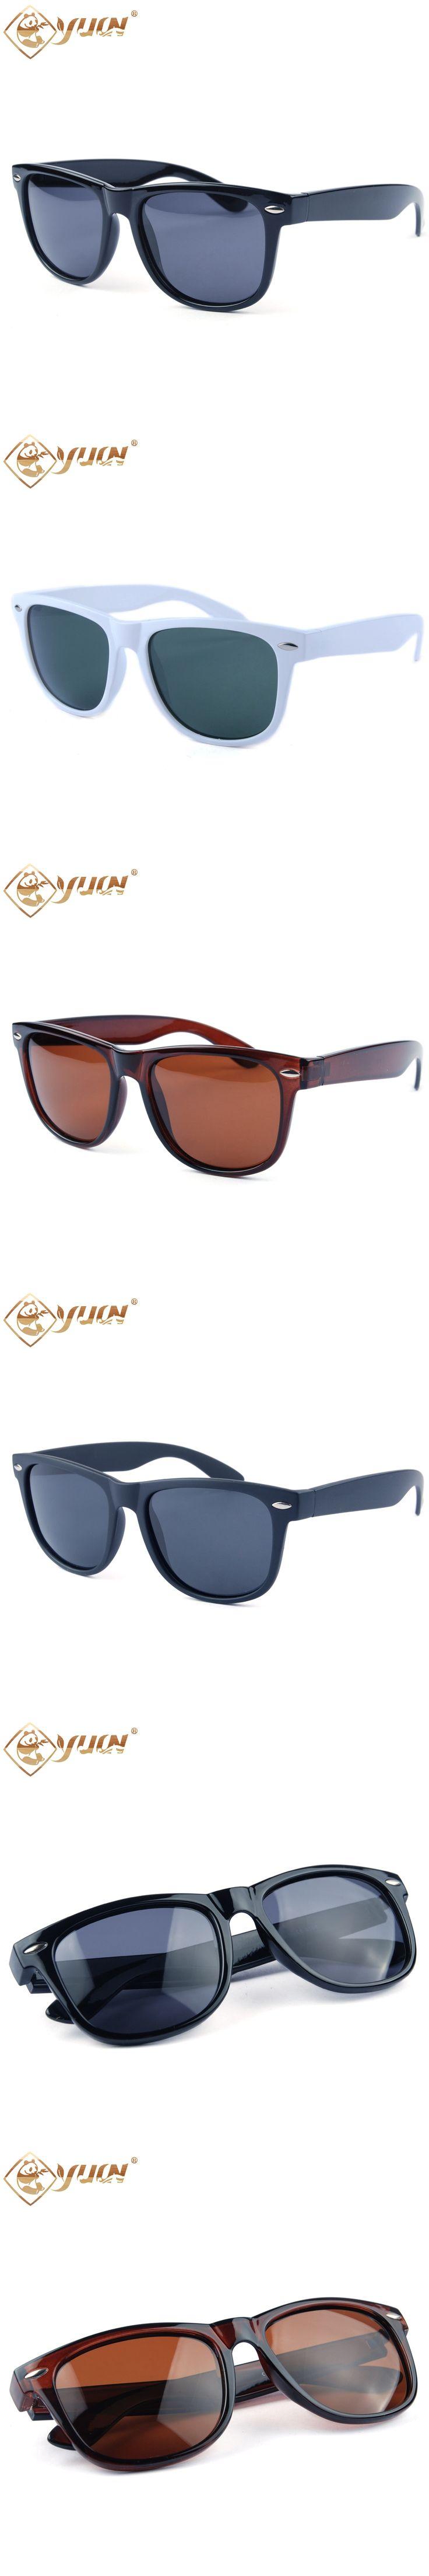 2017 Fashion Brand Polarized Sunglasses Men Polaroid Top Quality Sun Glasses Goggle Fishing Eyewear Oculos de sol